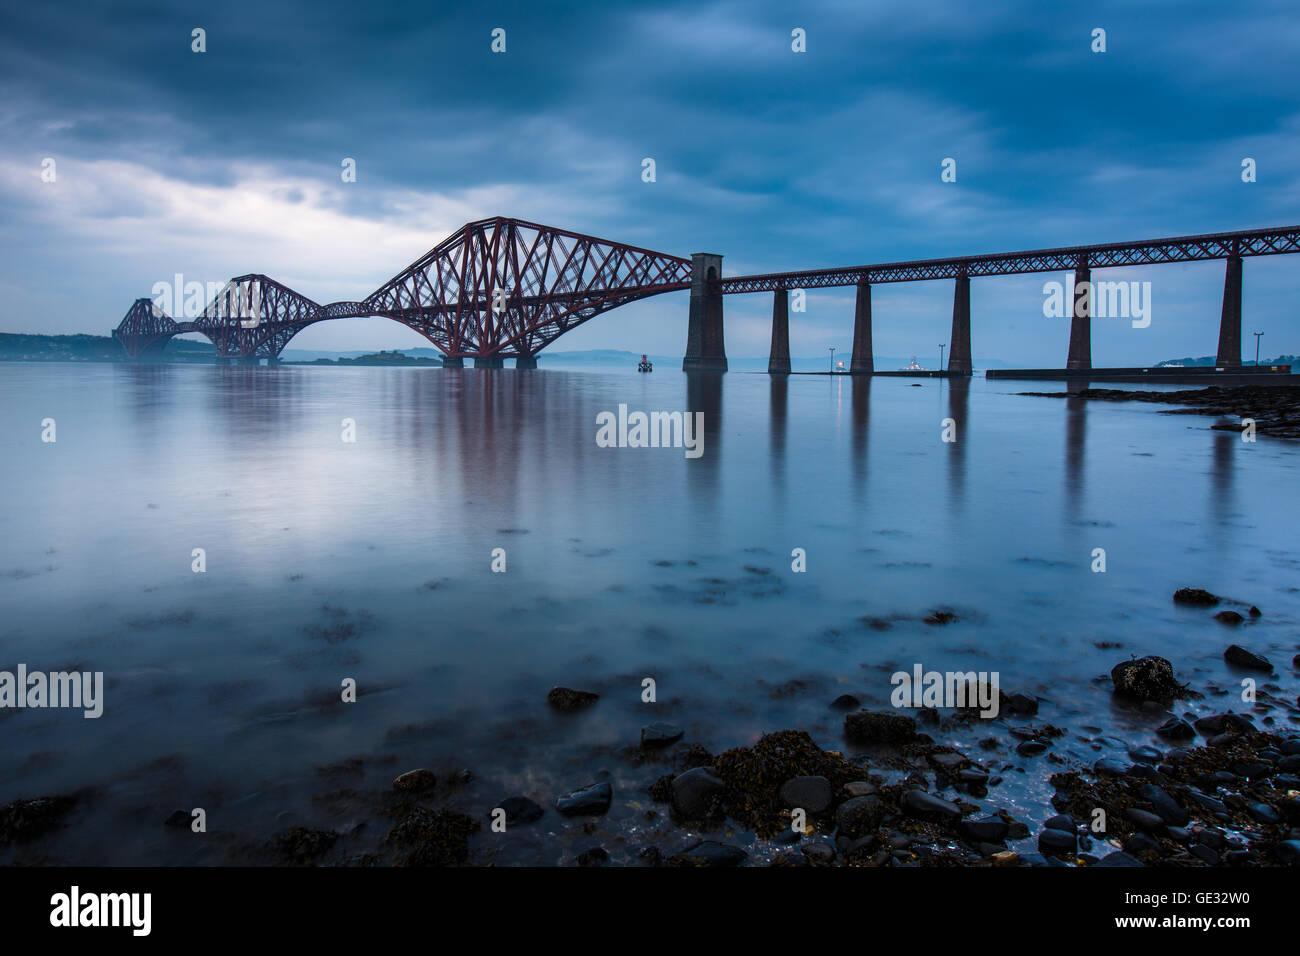 Forth bridges in Edinburgh, Scotland - Stock Image